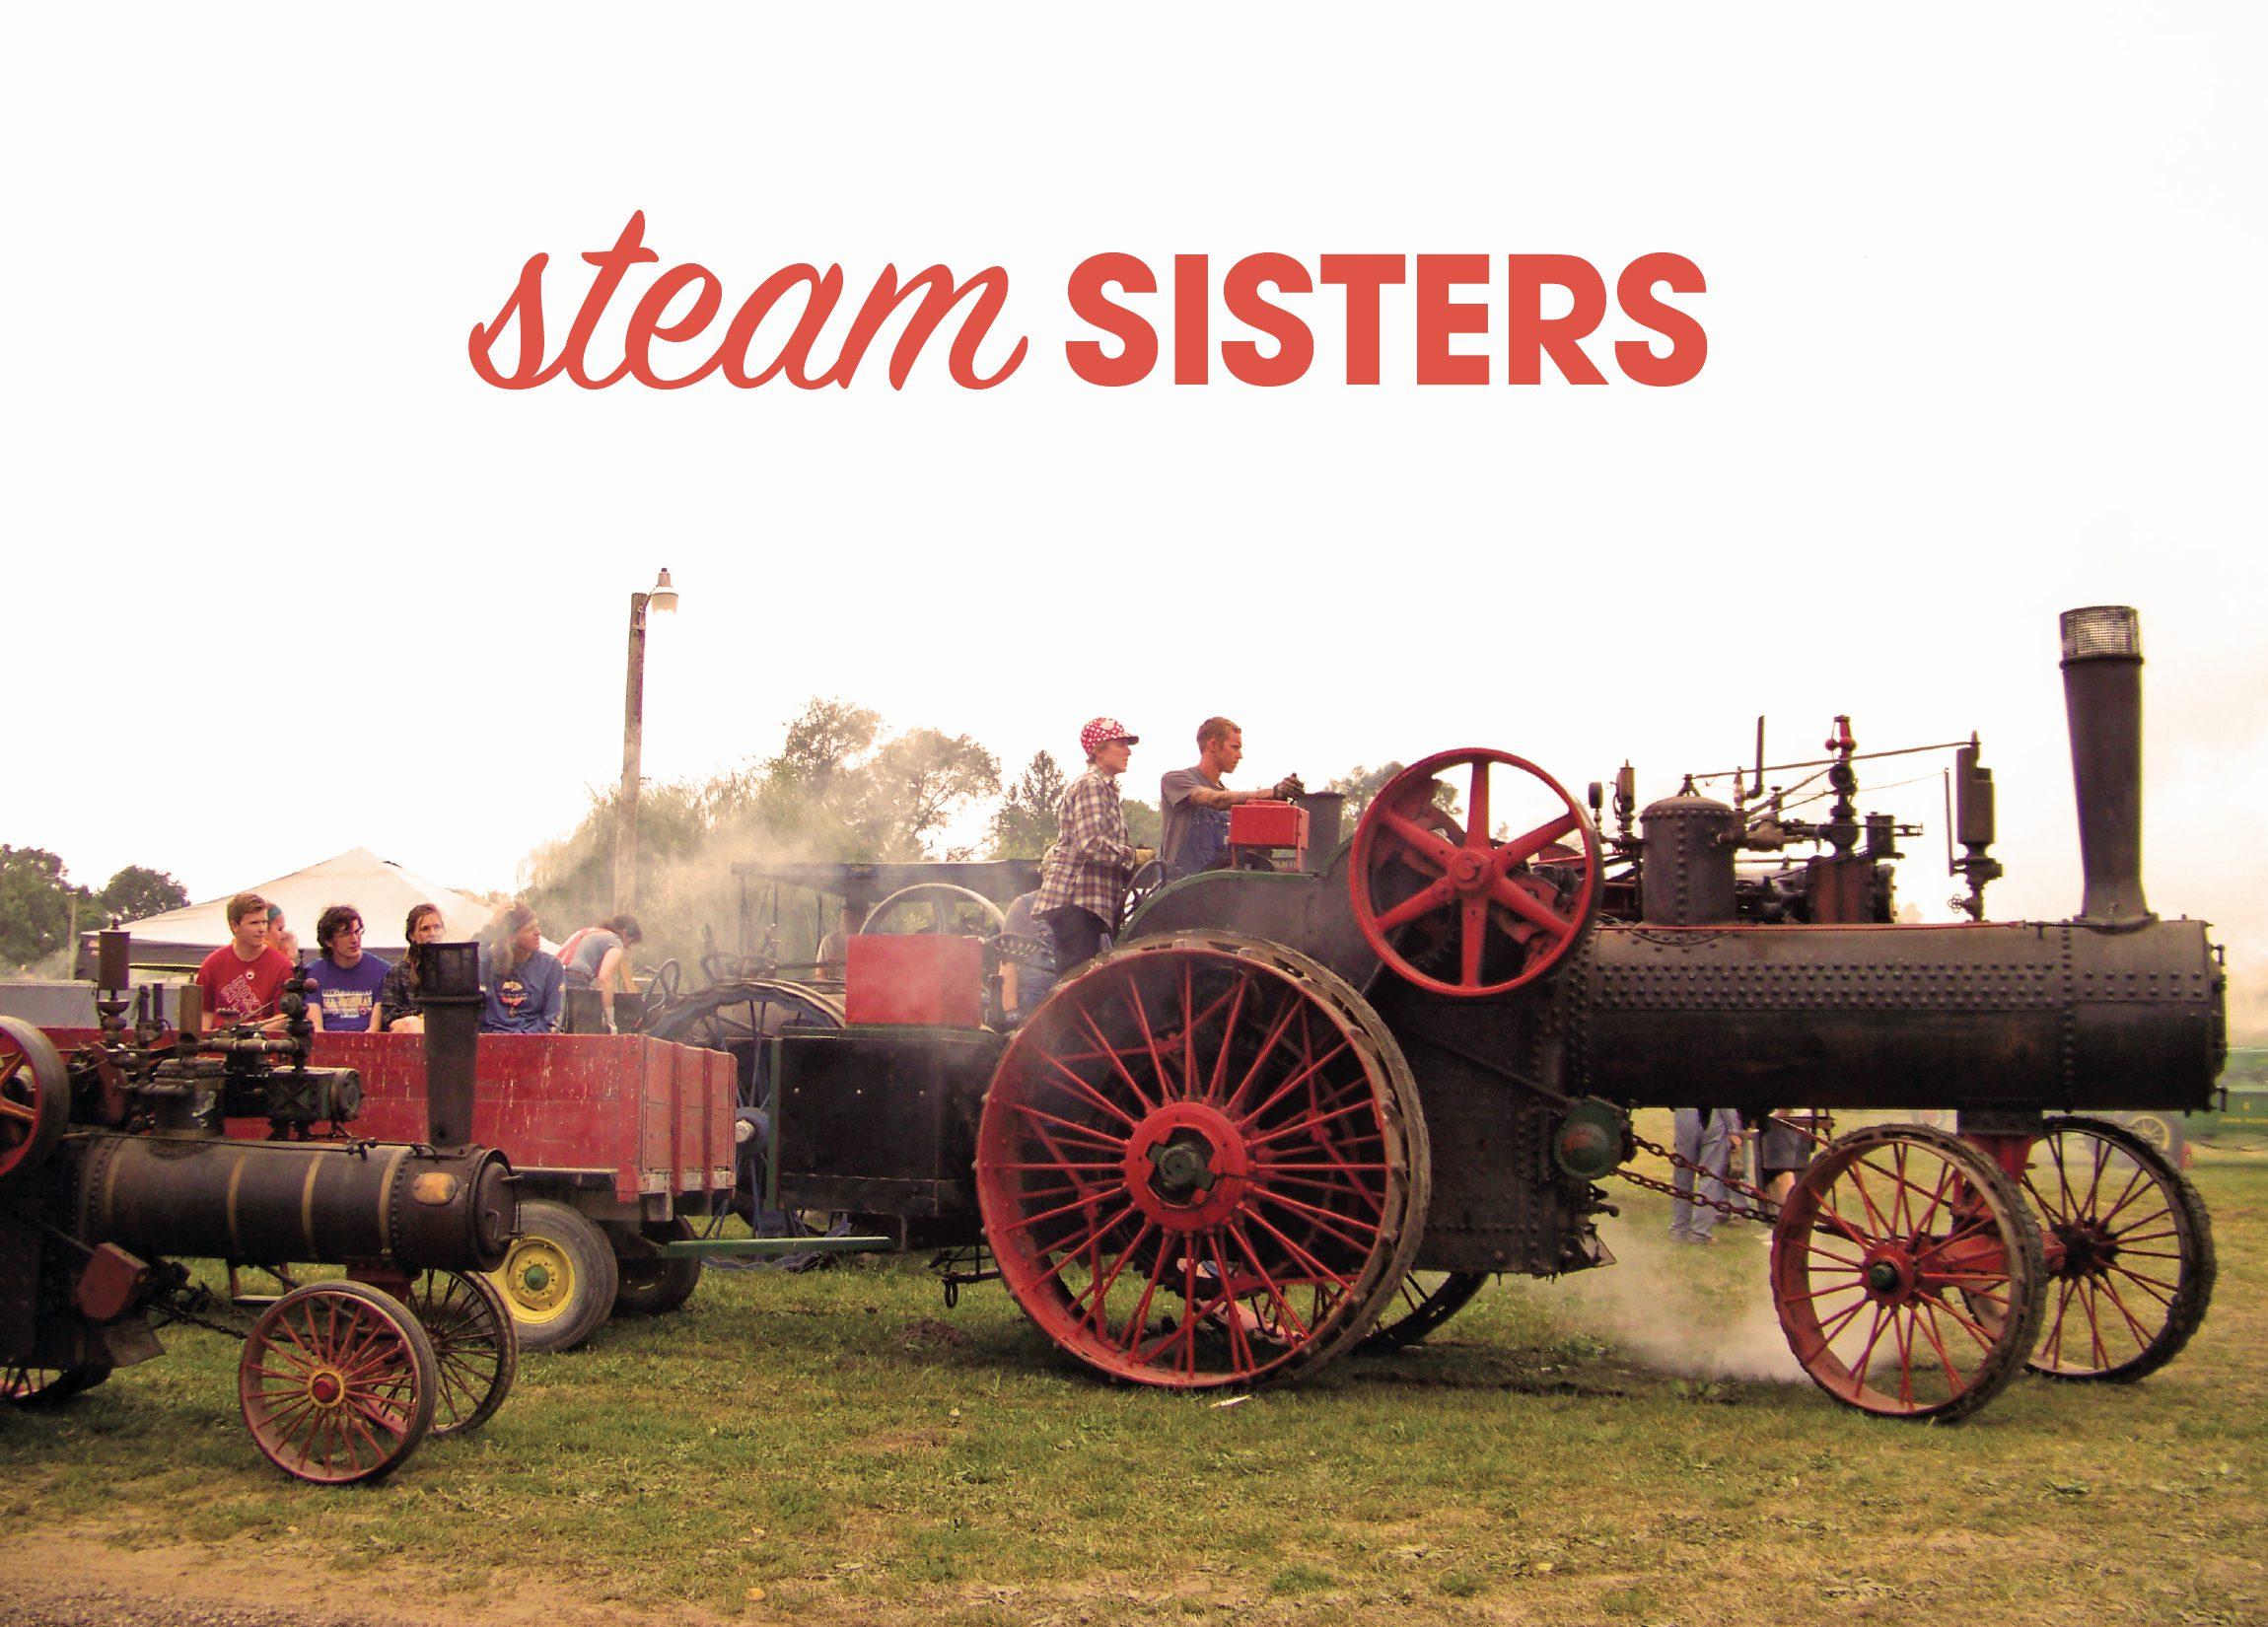 SteamSistersTopPhoto